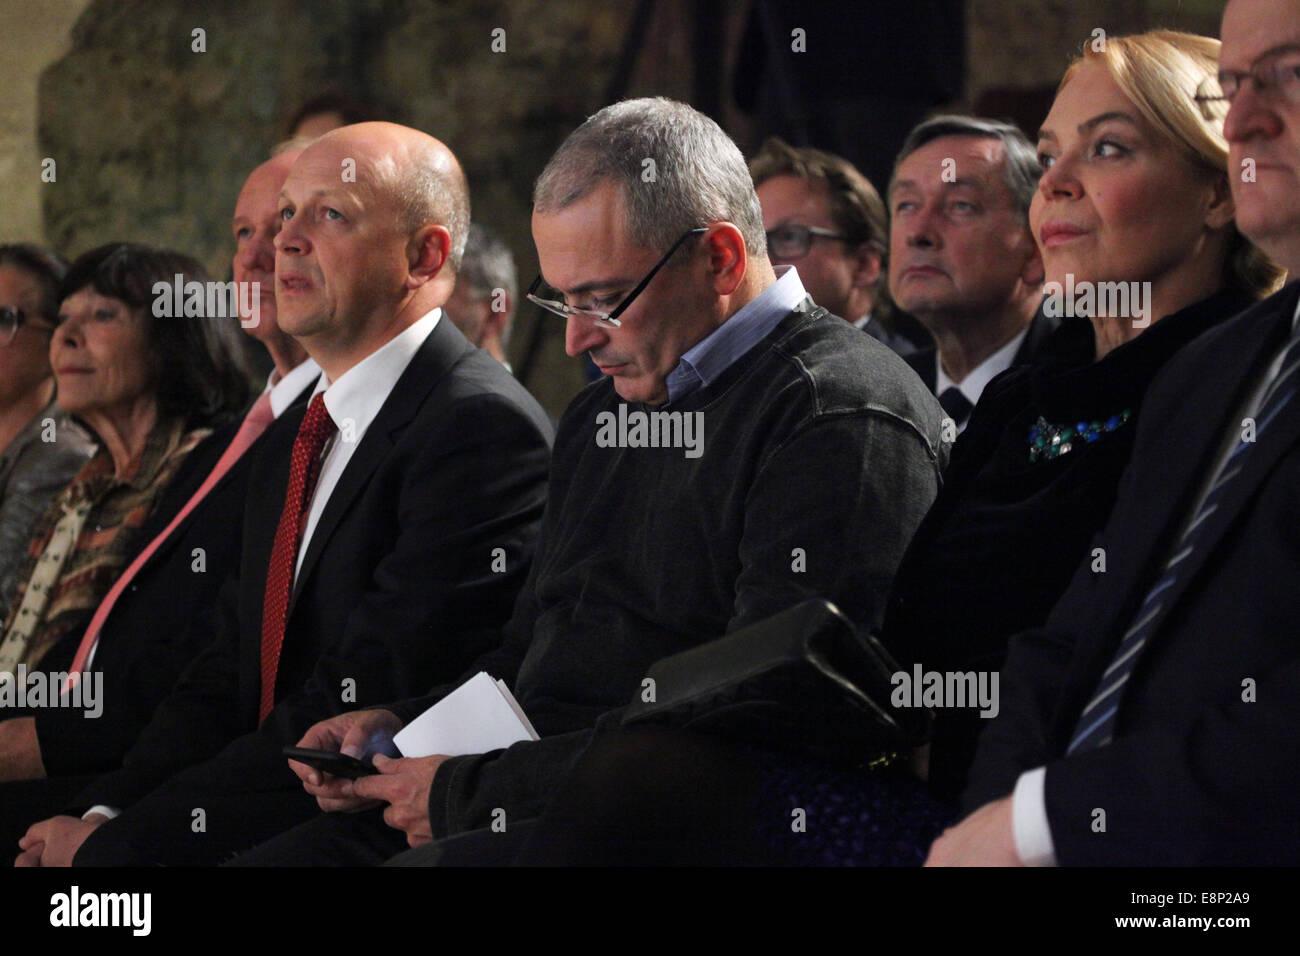 Prague, Czech Republic. 12th October, 2014. Russian former oil tycoon and political prisoner Mikhail Khodorkovsky - Stock Image